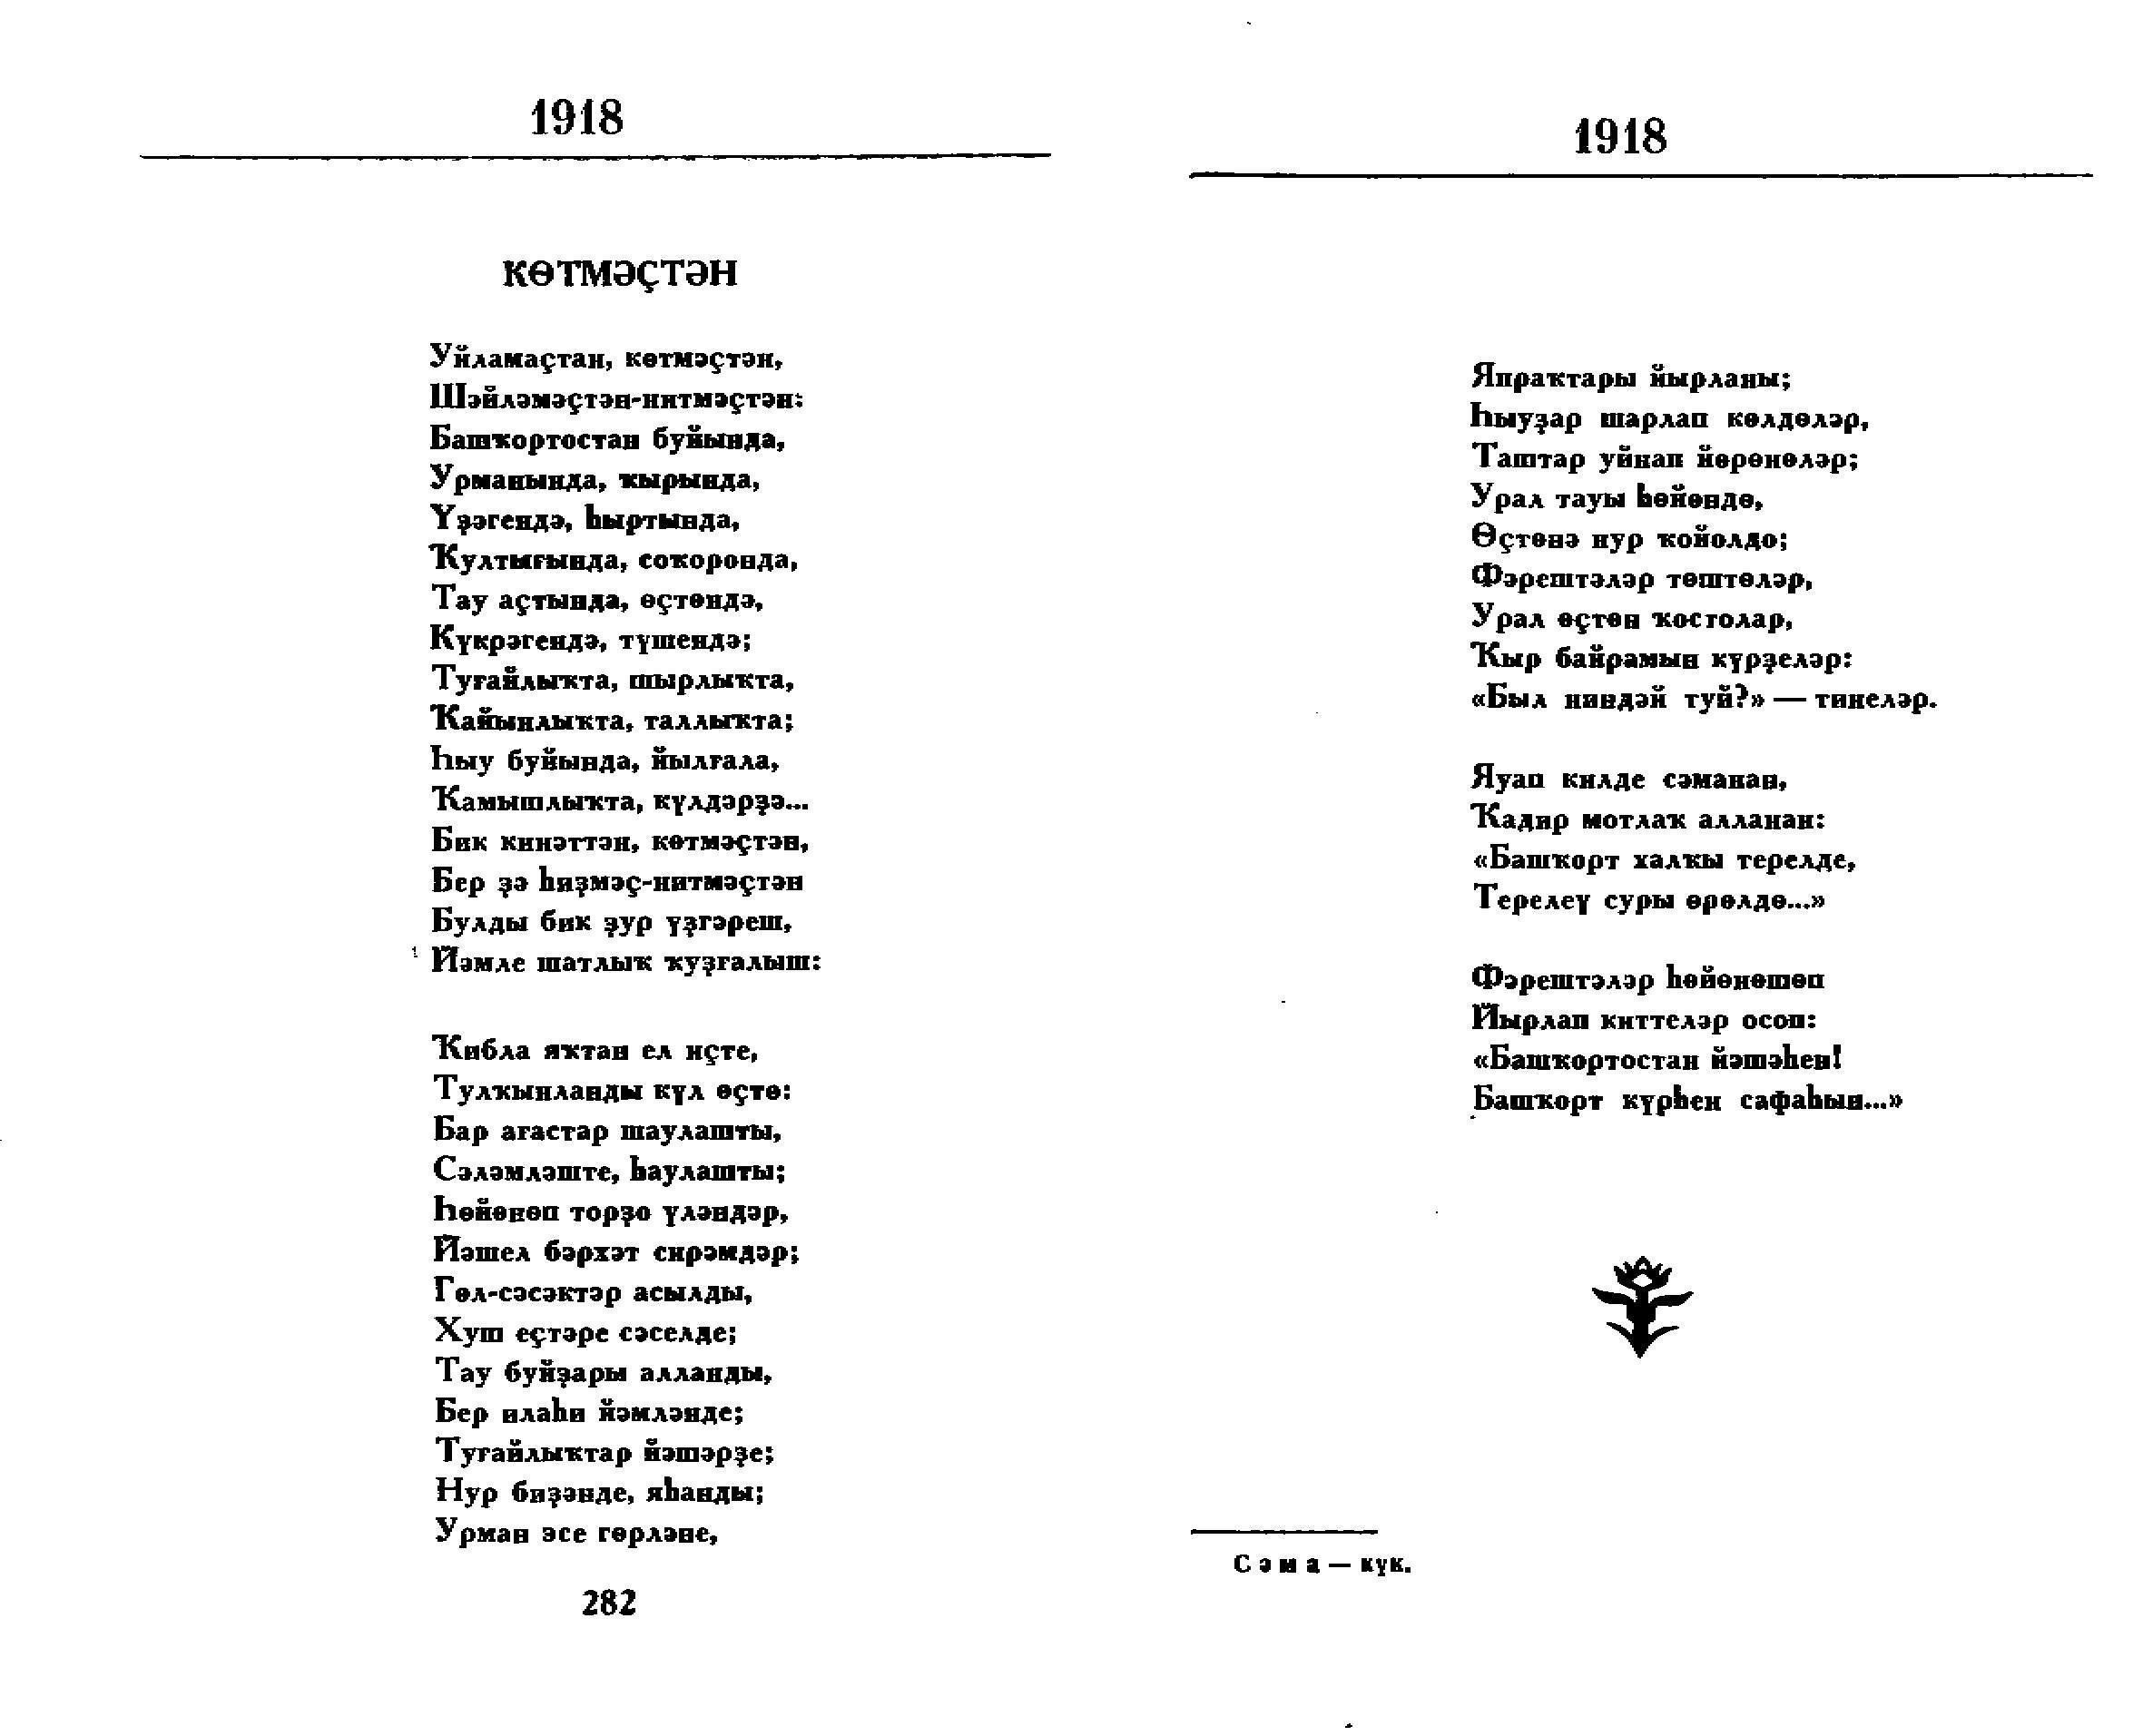 Сценарий на башкирскую свадьбу на башкирском языке